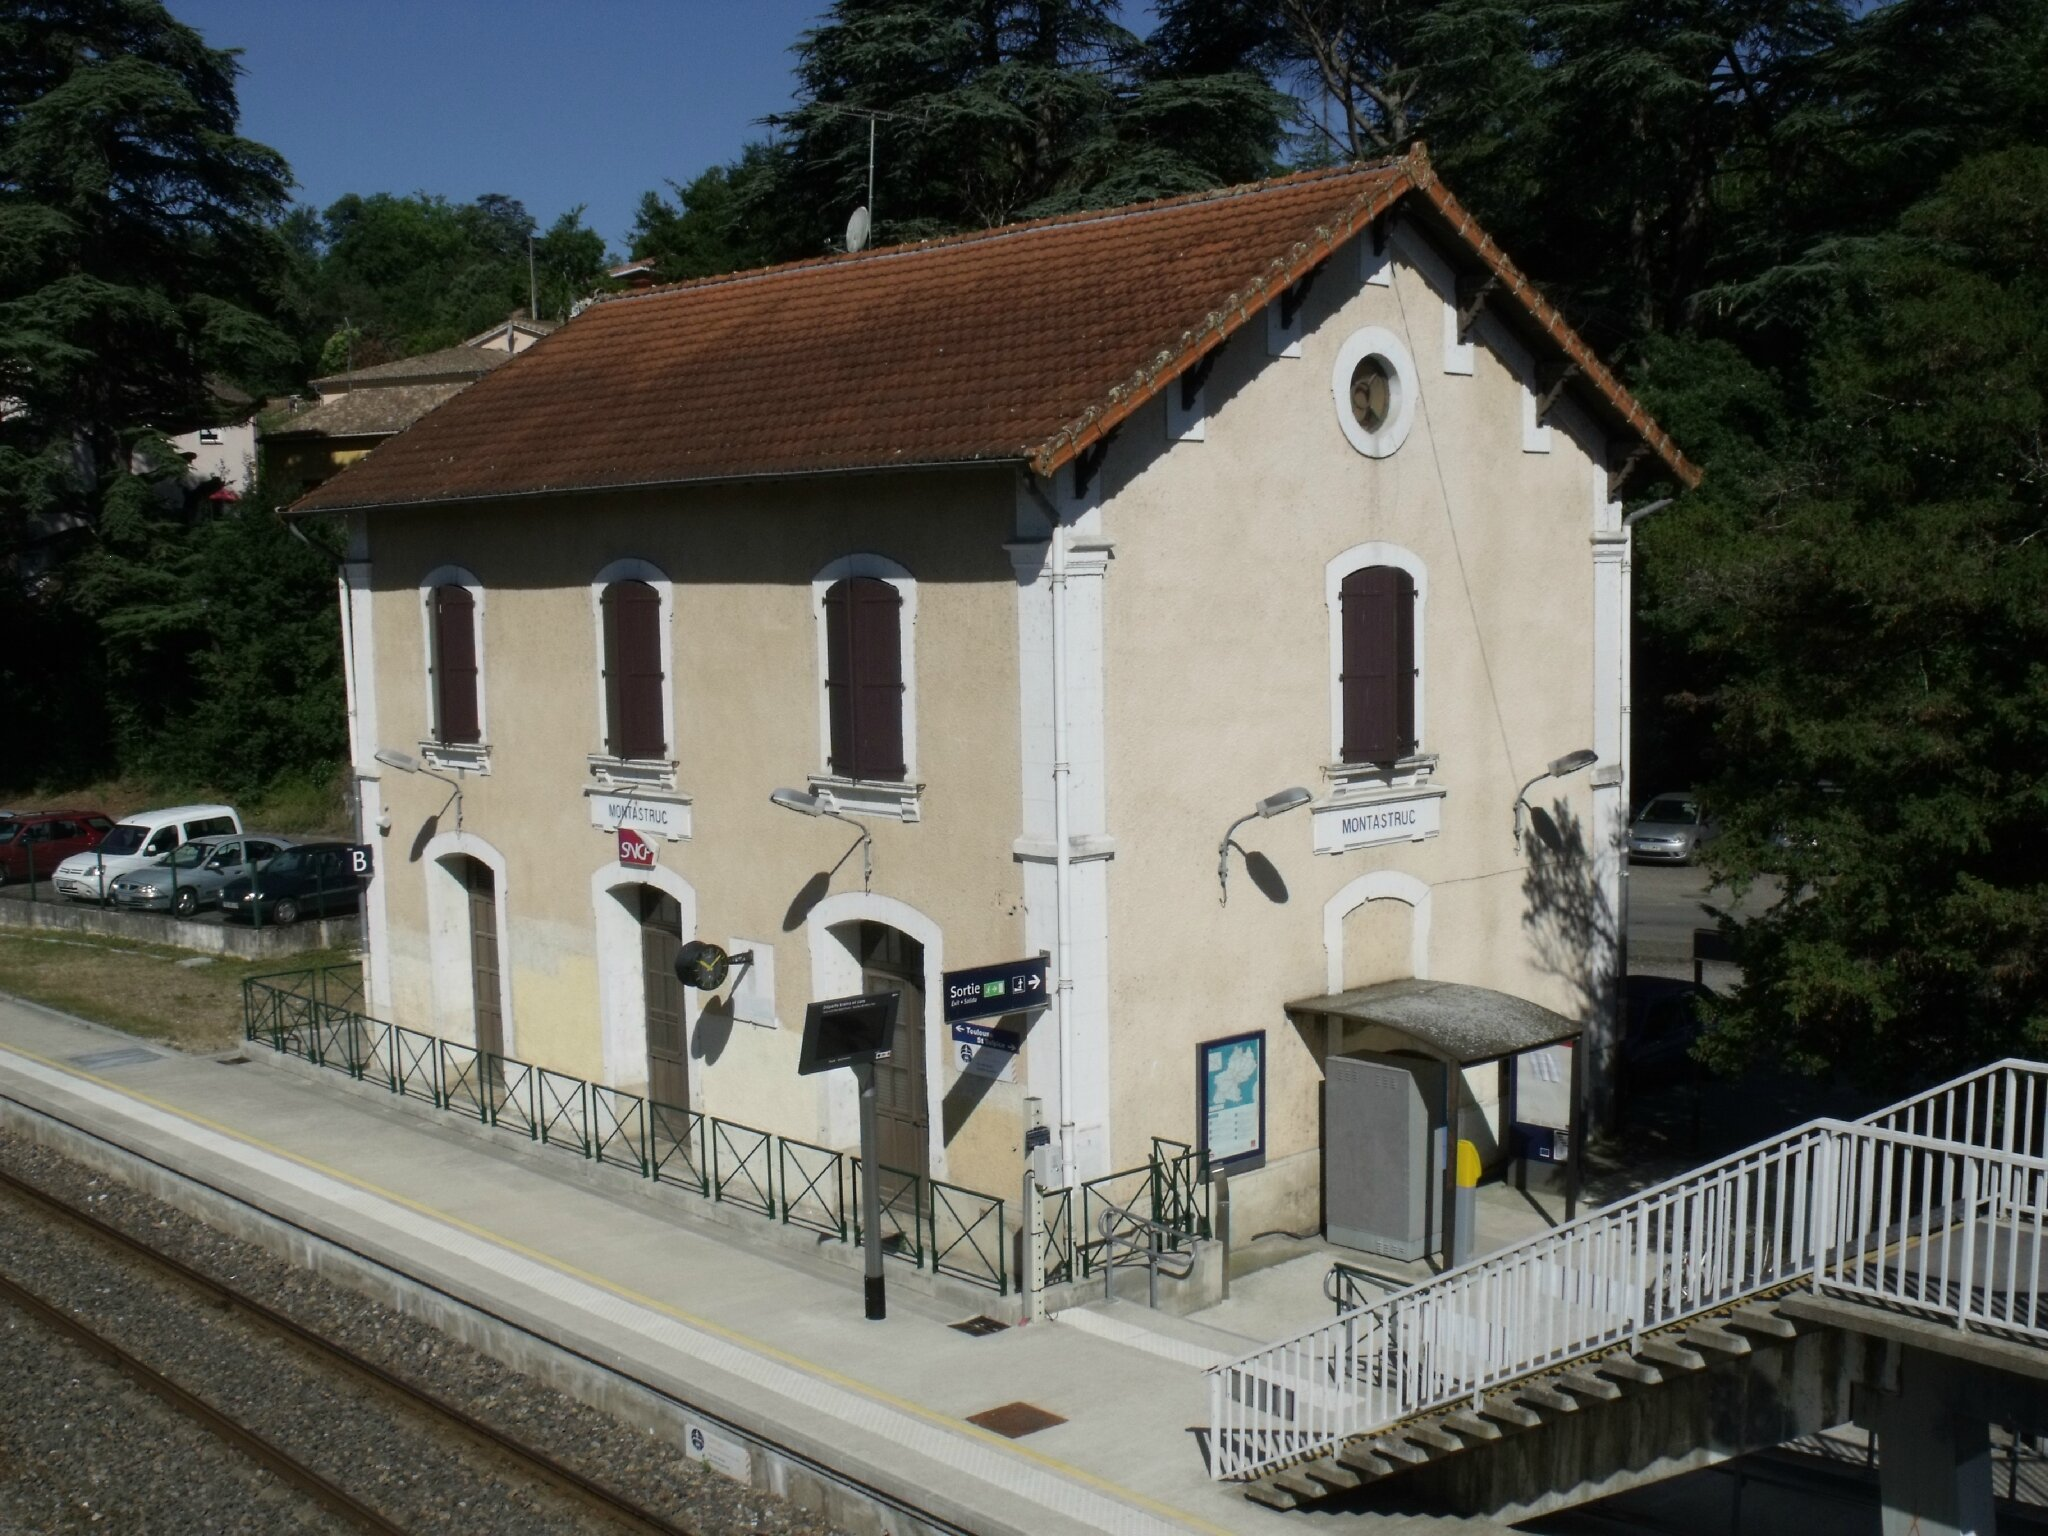 Montastruc-la-Conseillère (Haute-Garonne - 31)